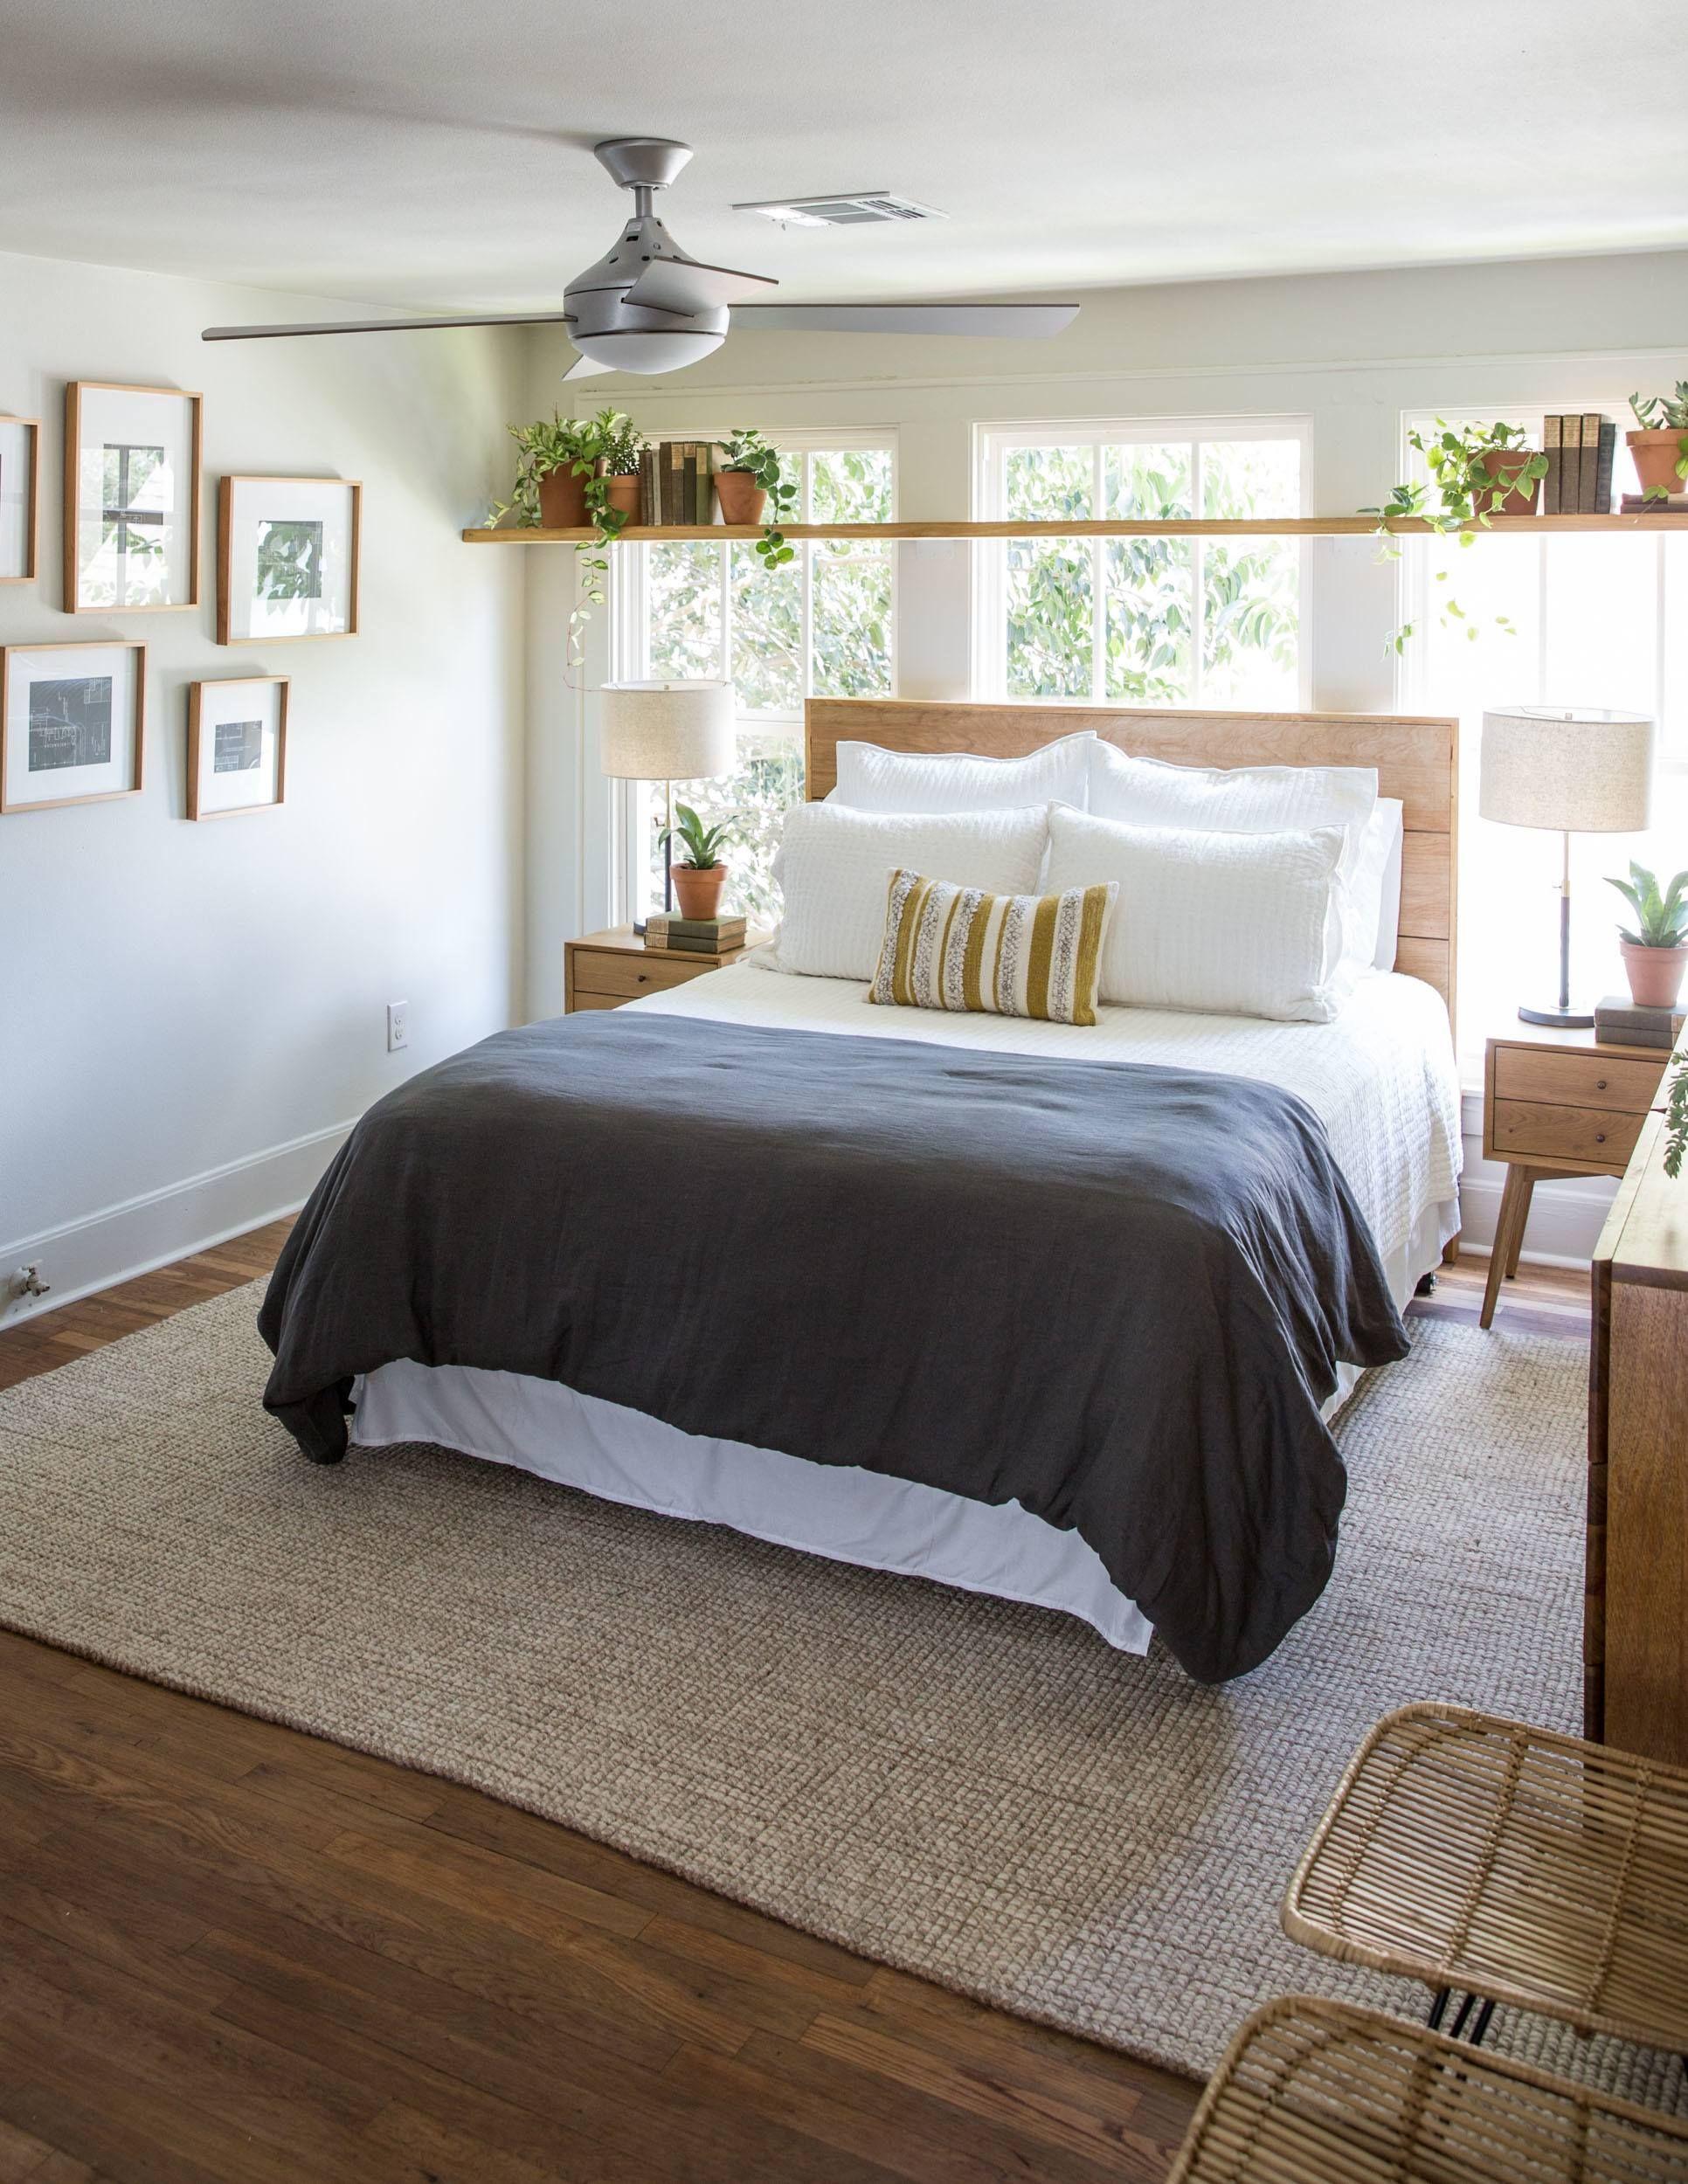 Episode 12 - The Giraffe House  Magnolia  Small master bedroom